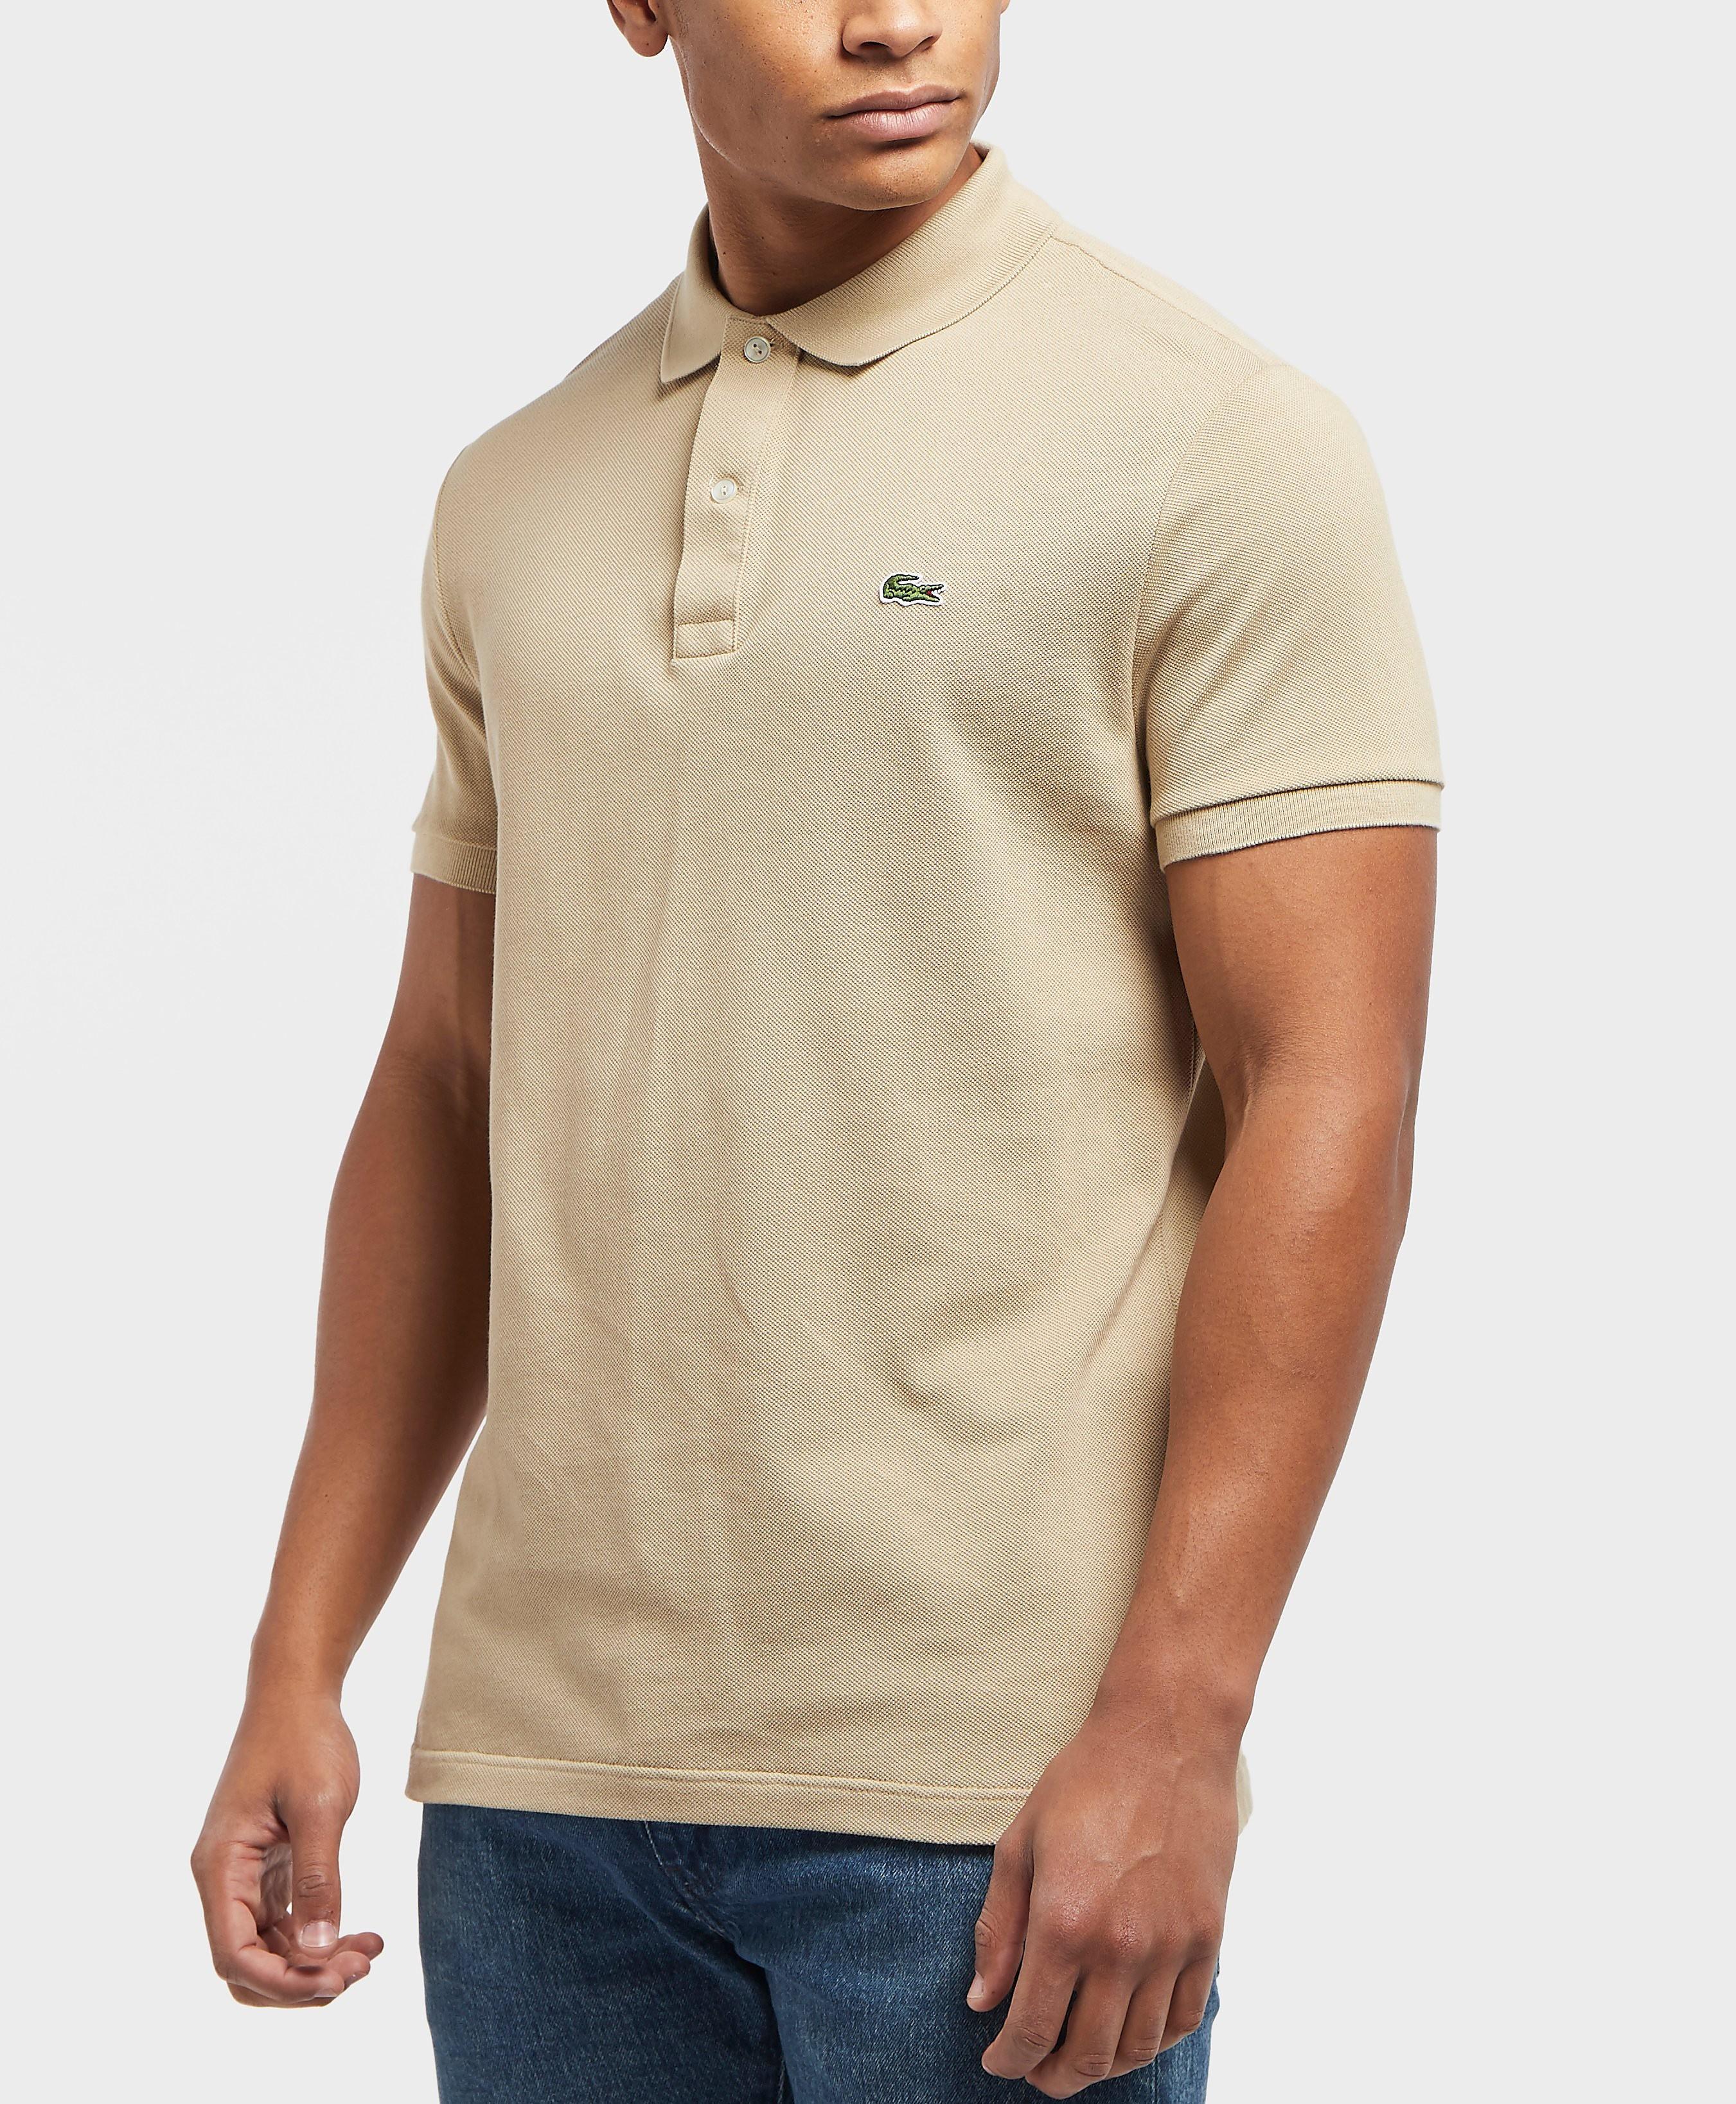 Lacoste L1212 Slim Short Sleeve Polo Shirt